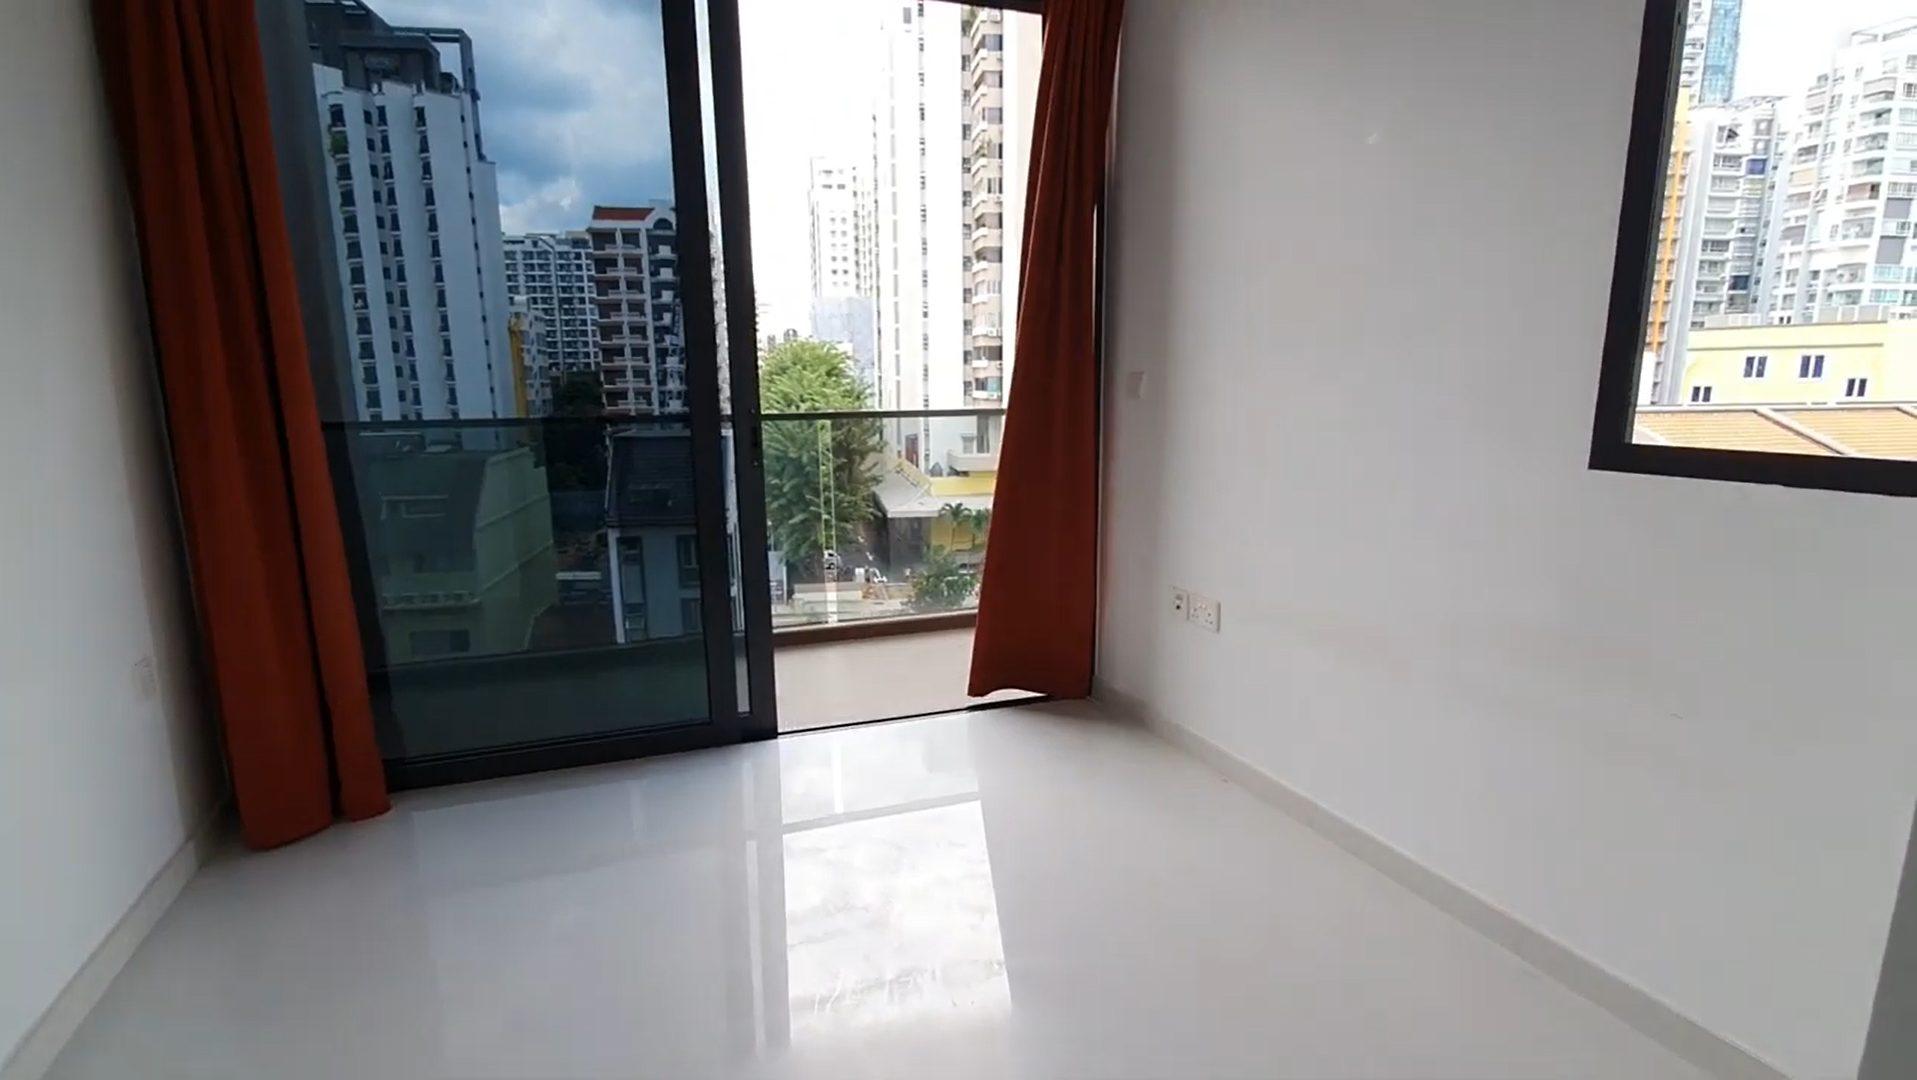 hong ling condo balestier master bedroom